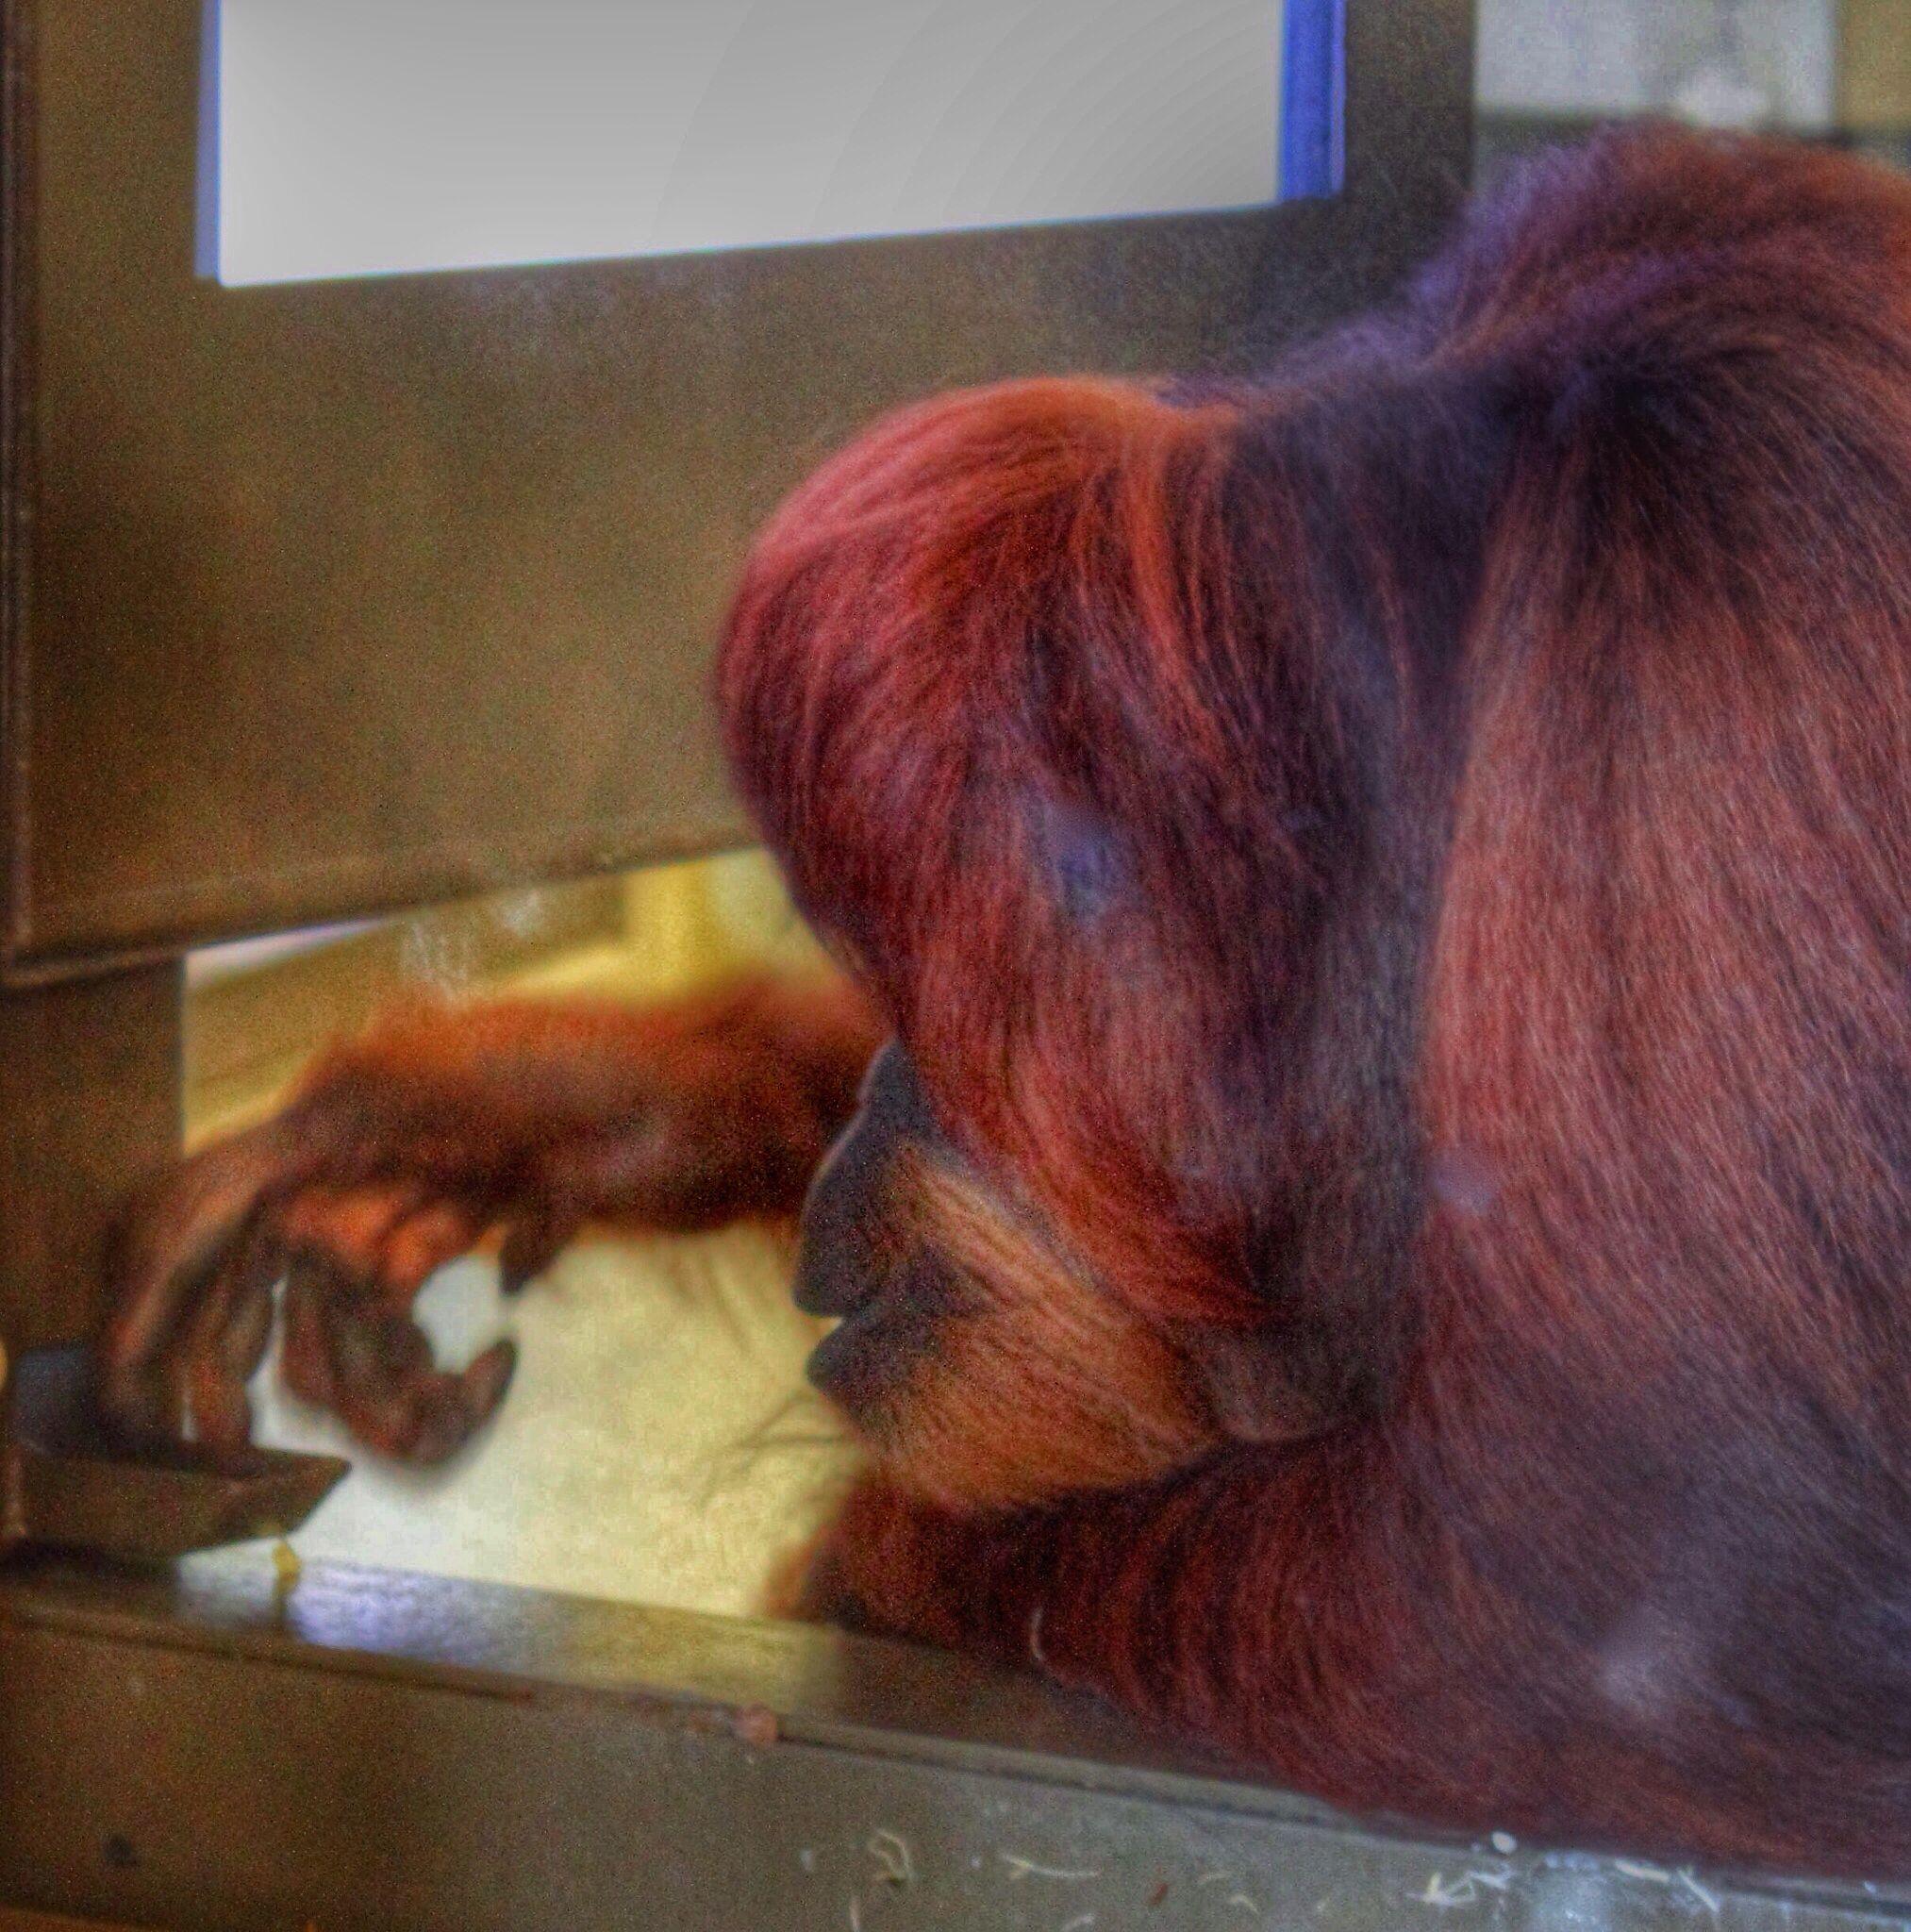 Orangutan Exhibit Indianapolis Zoo Indianapolis Zoo Orangutan Indianapolis